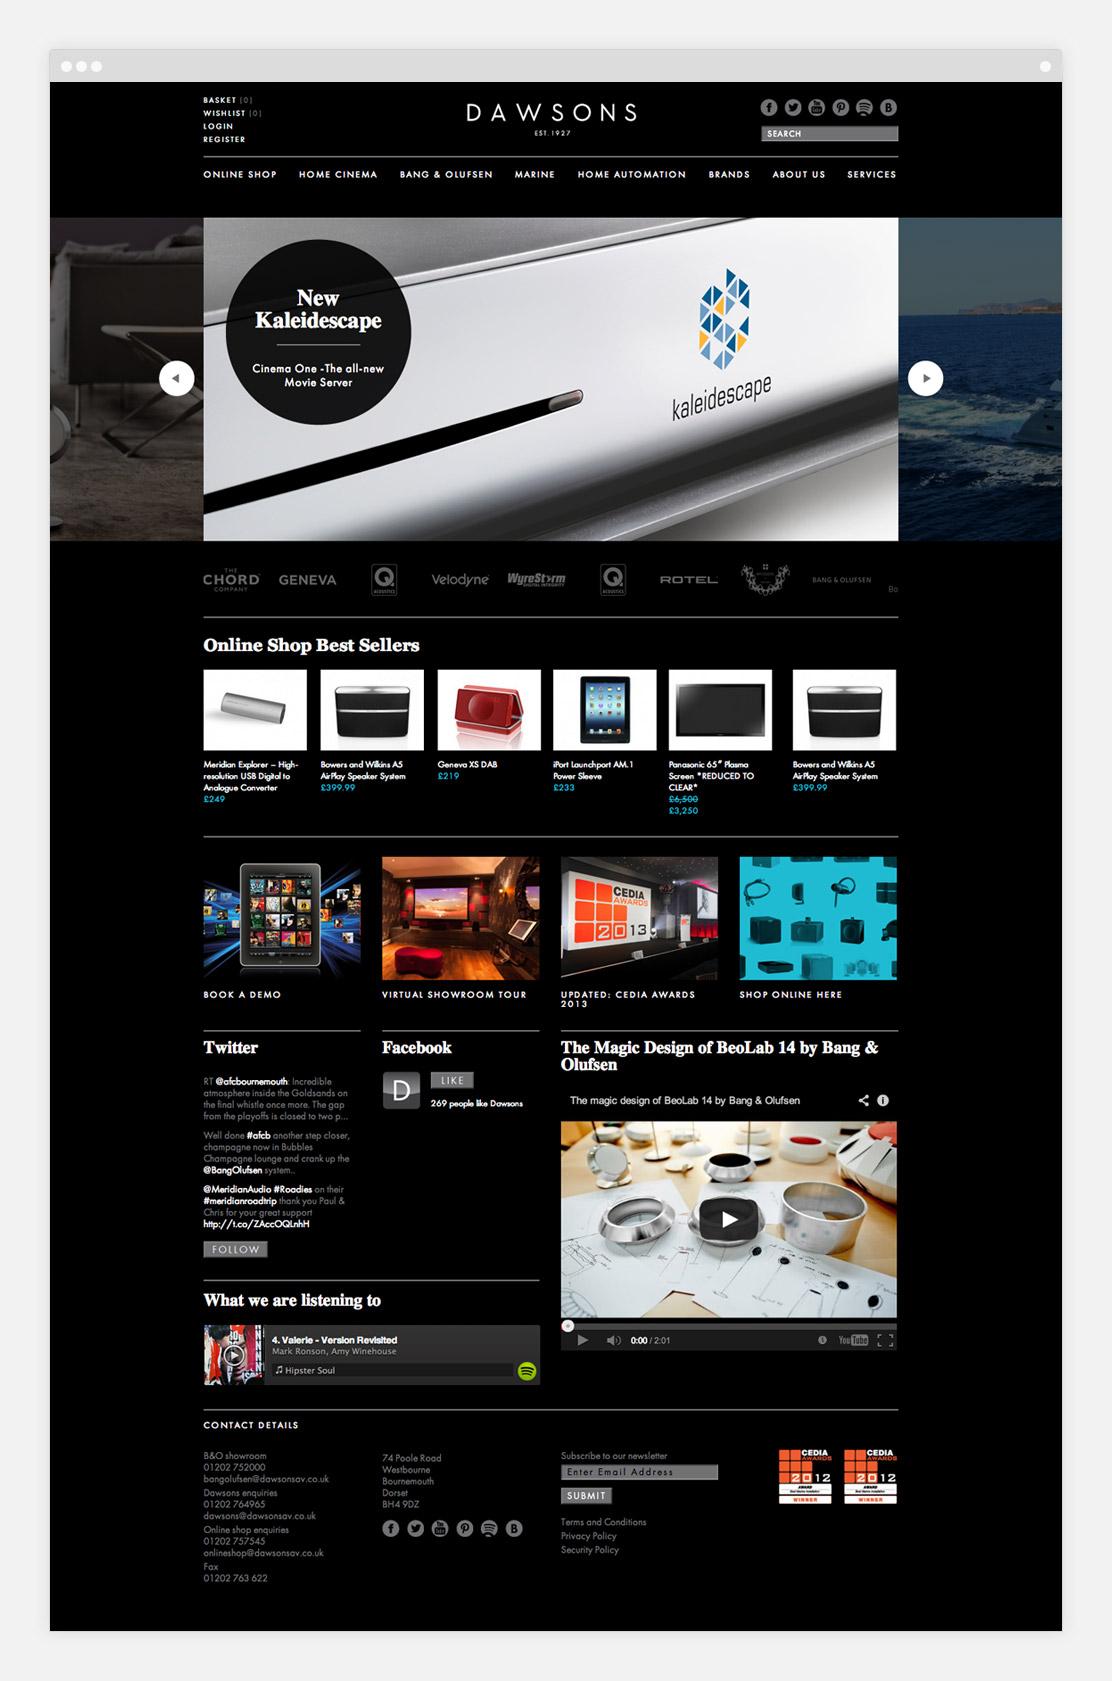 Dawsons website